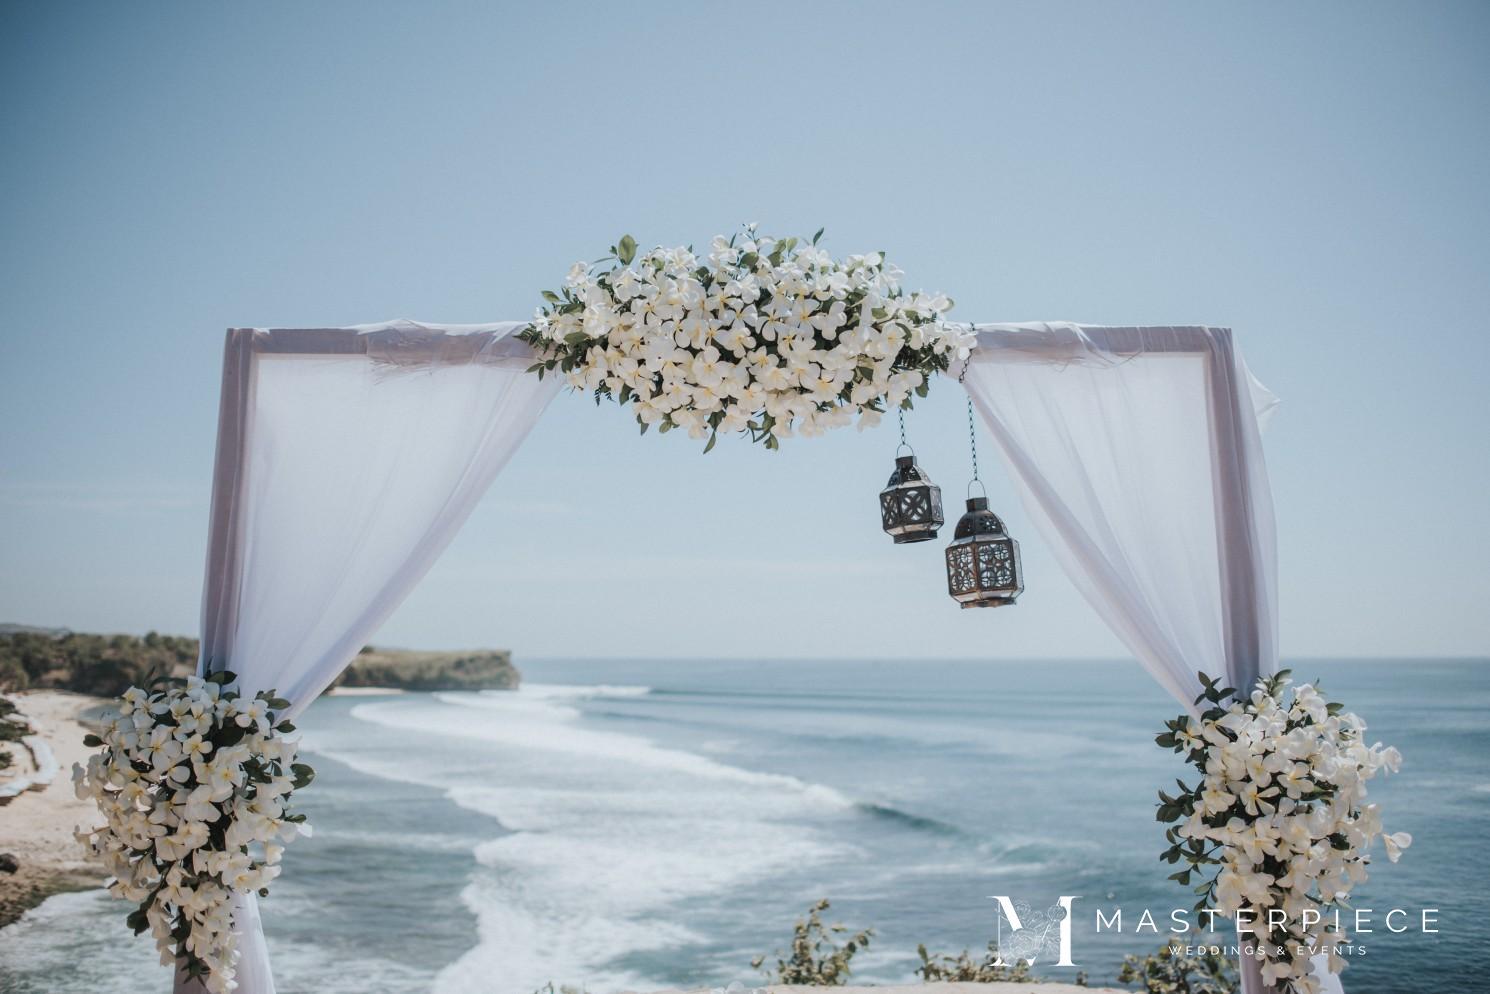 Masterpiece_Weddings_sluby_020